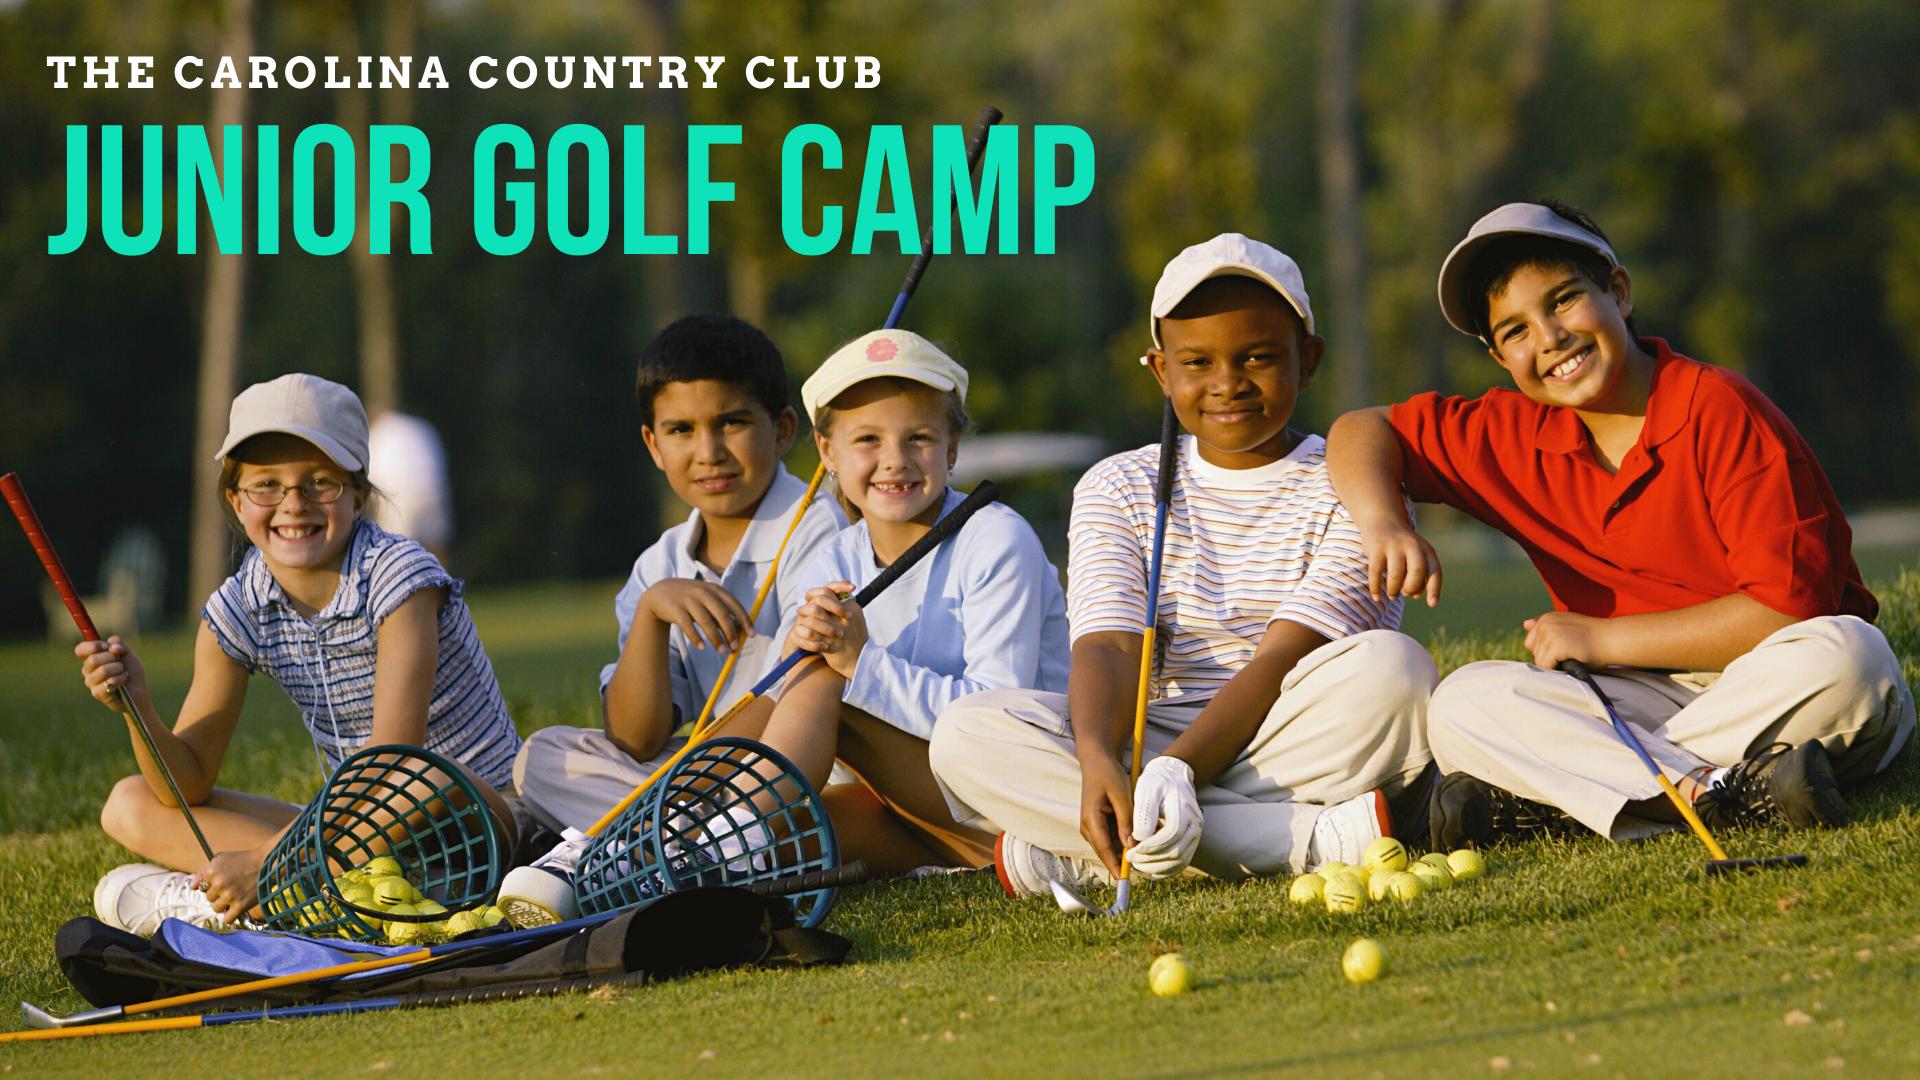 Summer Junior Golf Camp